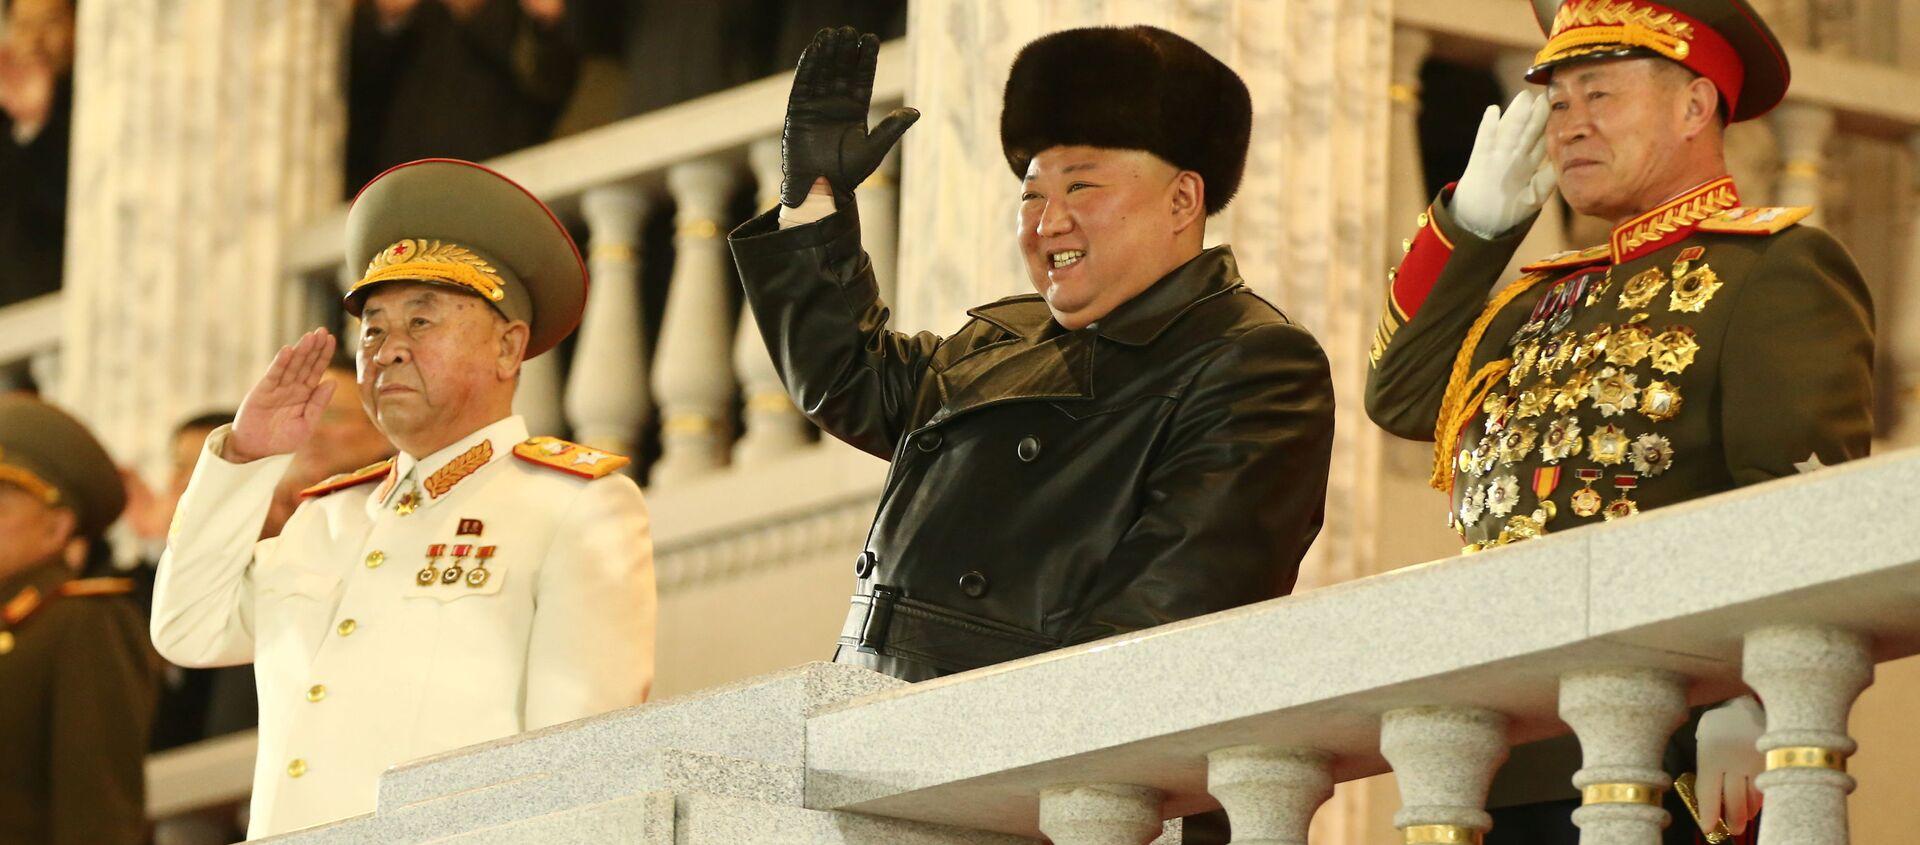 Kim Jong-un, líder de Corea del Norte - Sputnik Mundo, 1920, 28.01.2021